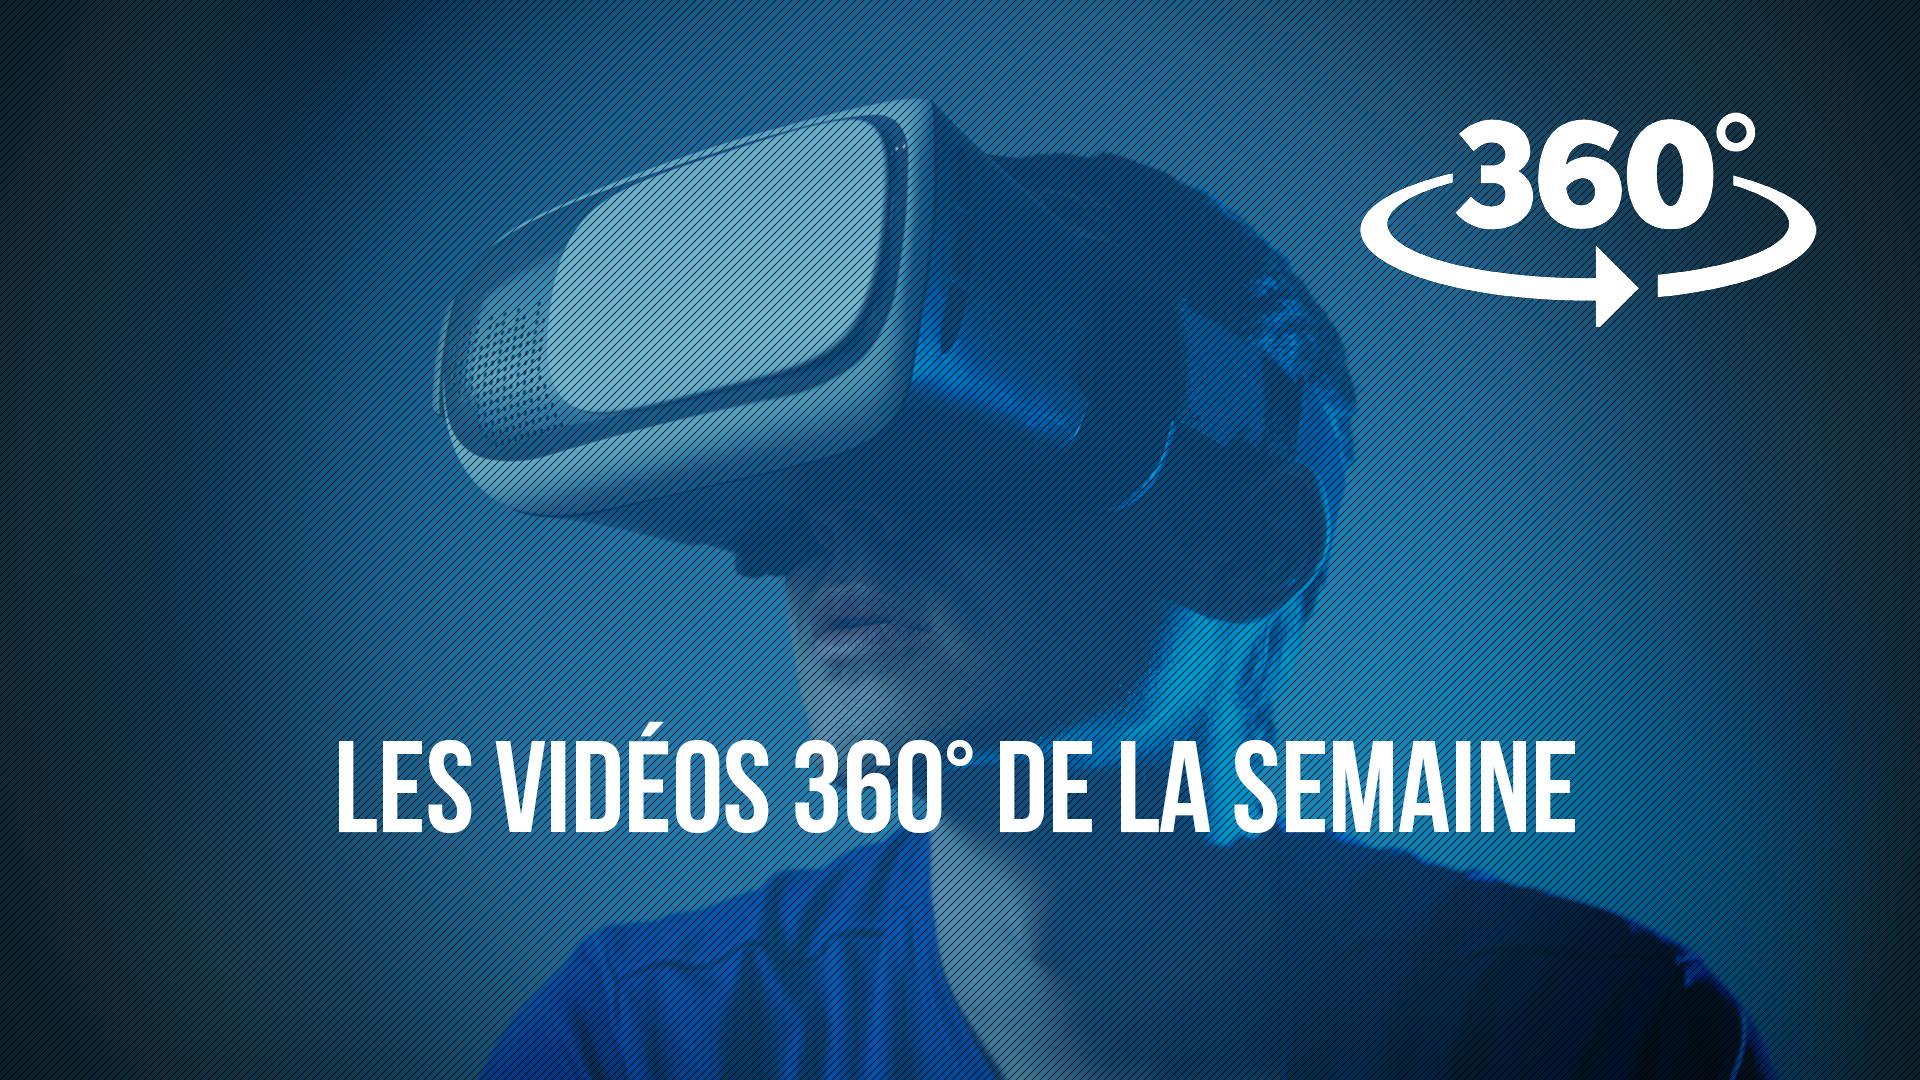 Les vidéos 360° de la semaine #4 – 100% Coaster